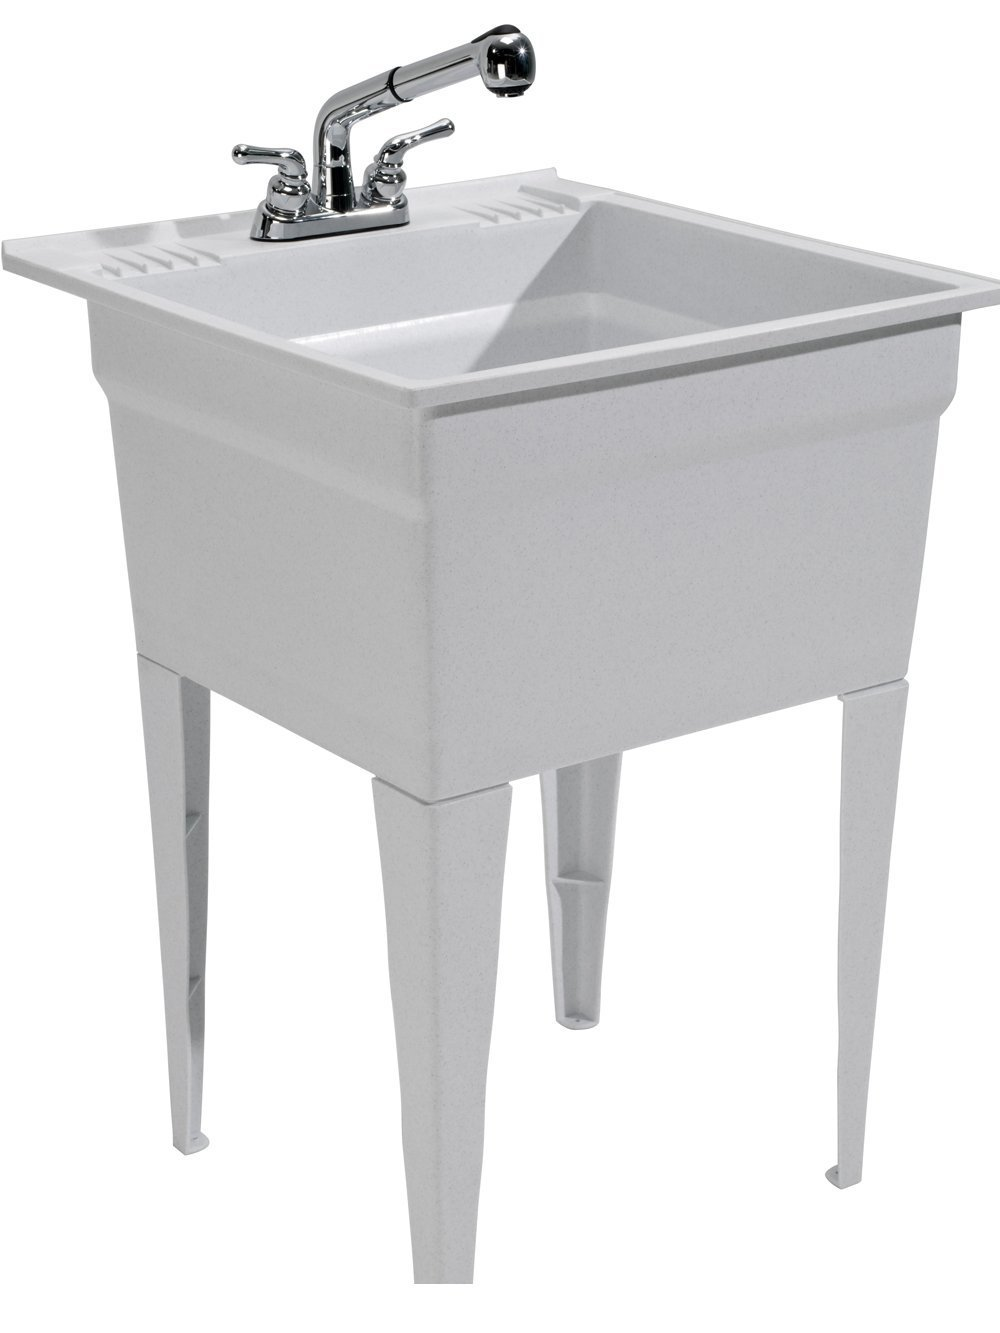 Cashel 1960 32 02 Heavy Duty Sink Fully Loaded Kit Granite Plumbing In Addition Kitchen Drain Diagrams